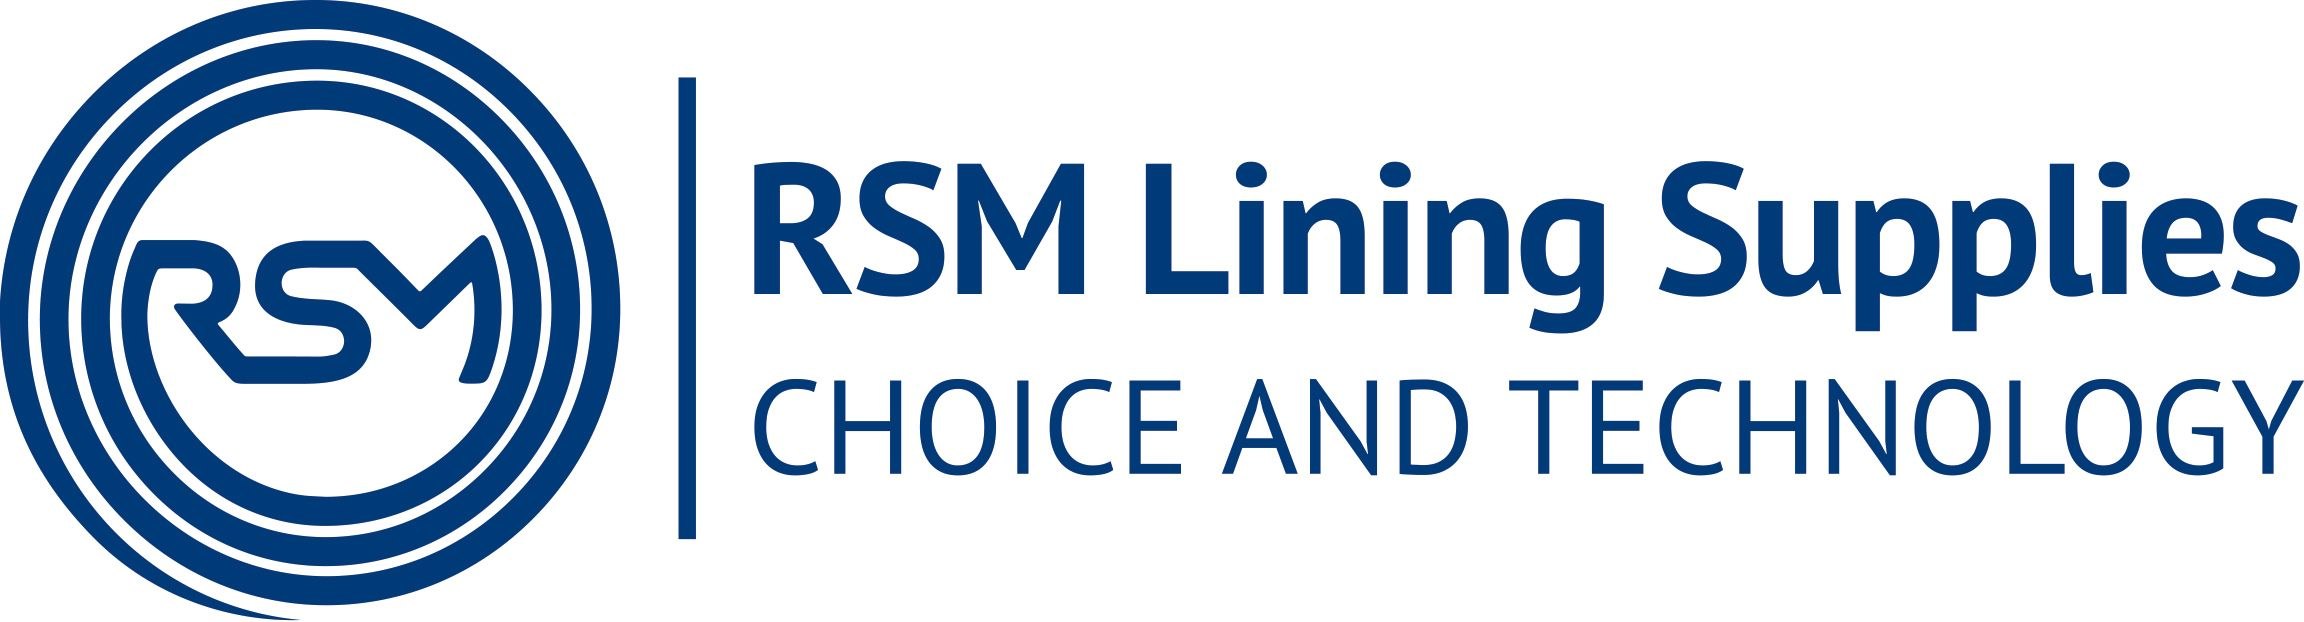 RSM Lining Supplies